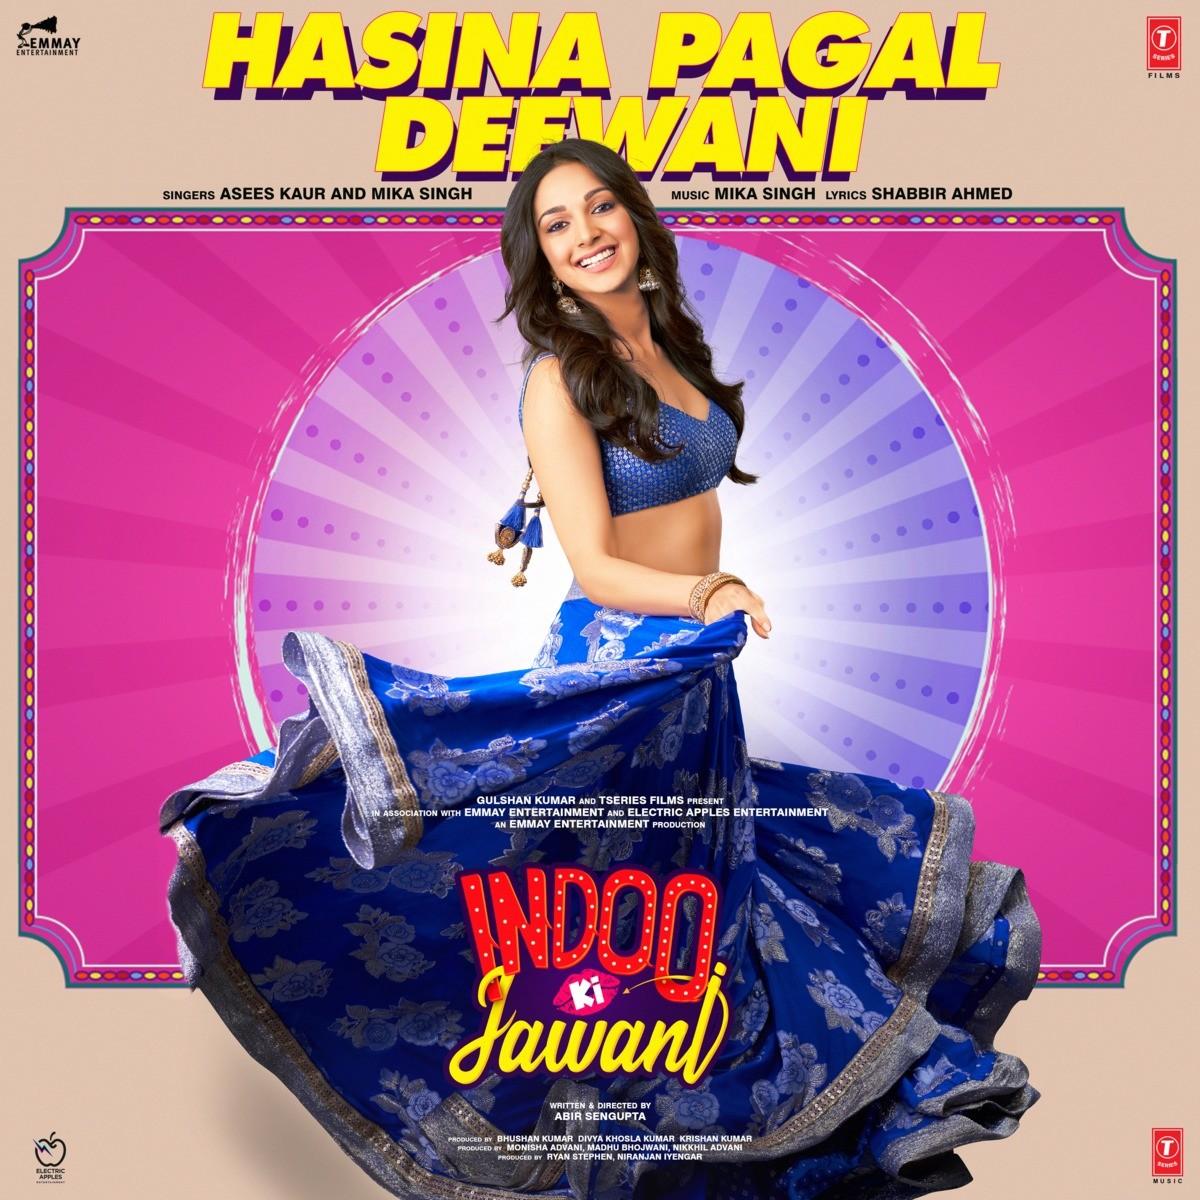 Watch Indoo ki jawani at cinema halls.